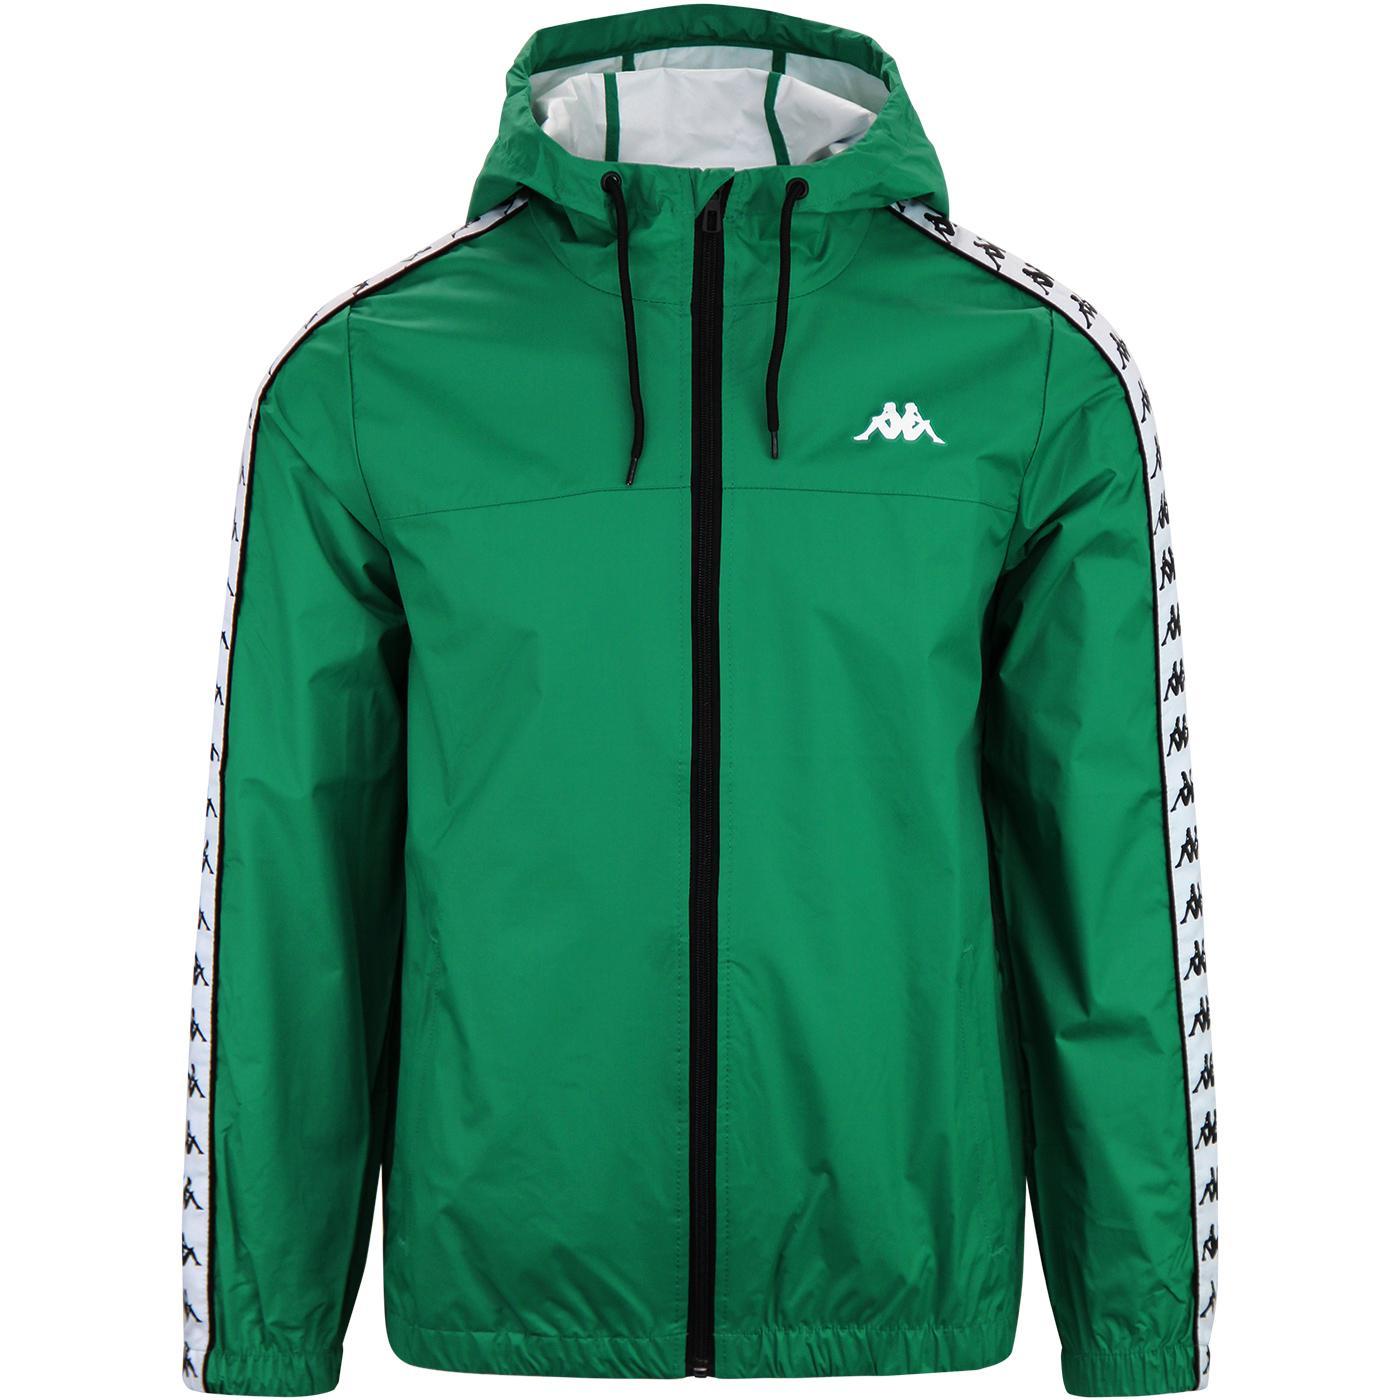 Dawson Banda KAPPA Retro 80s Hooded Jacket (Green)